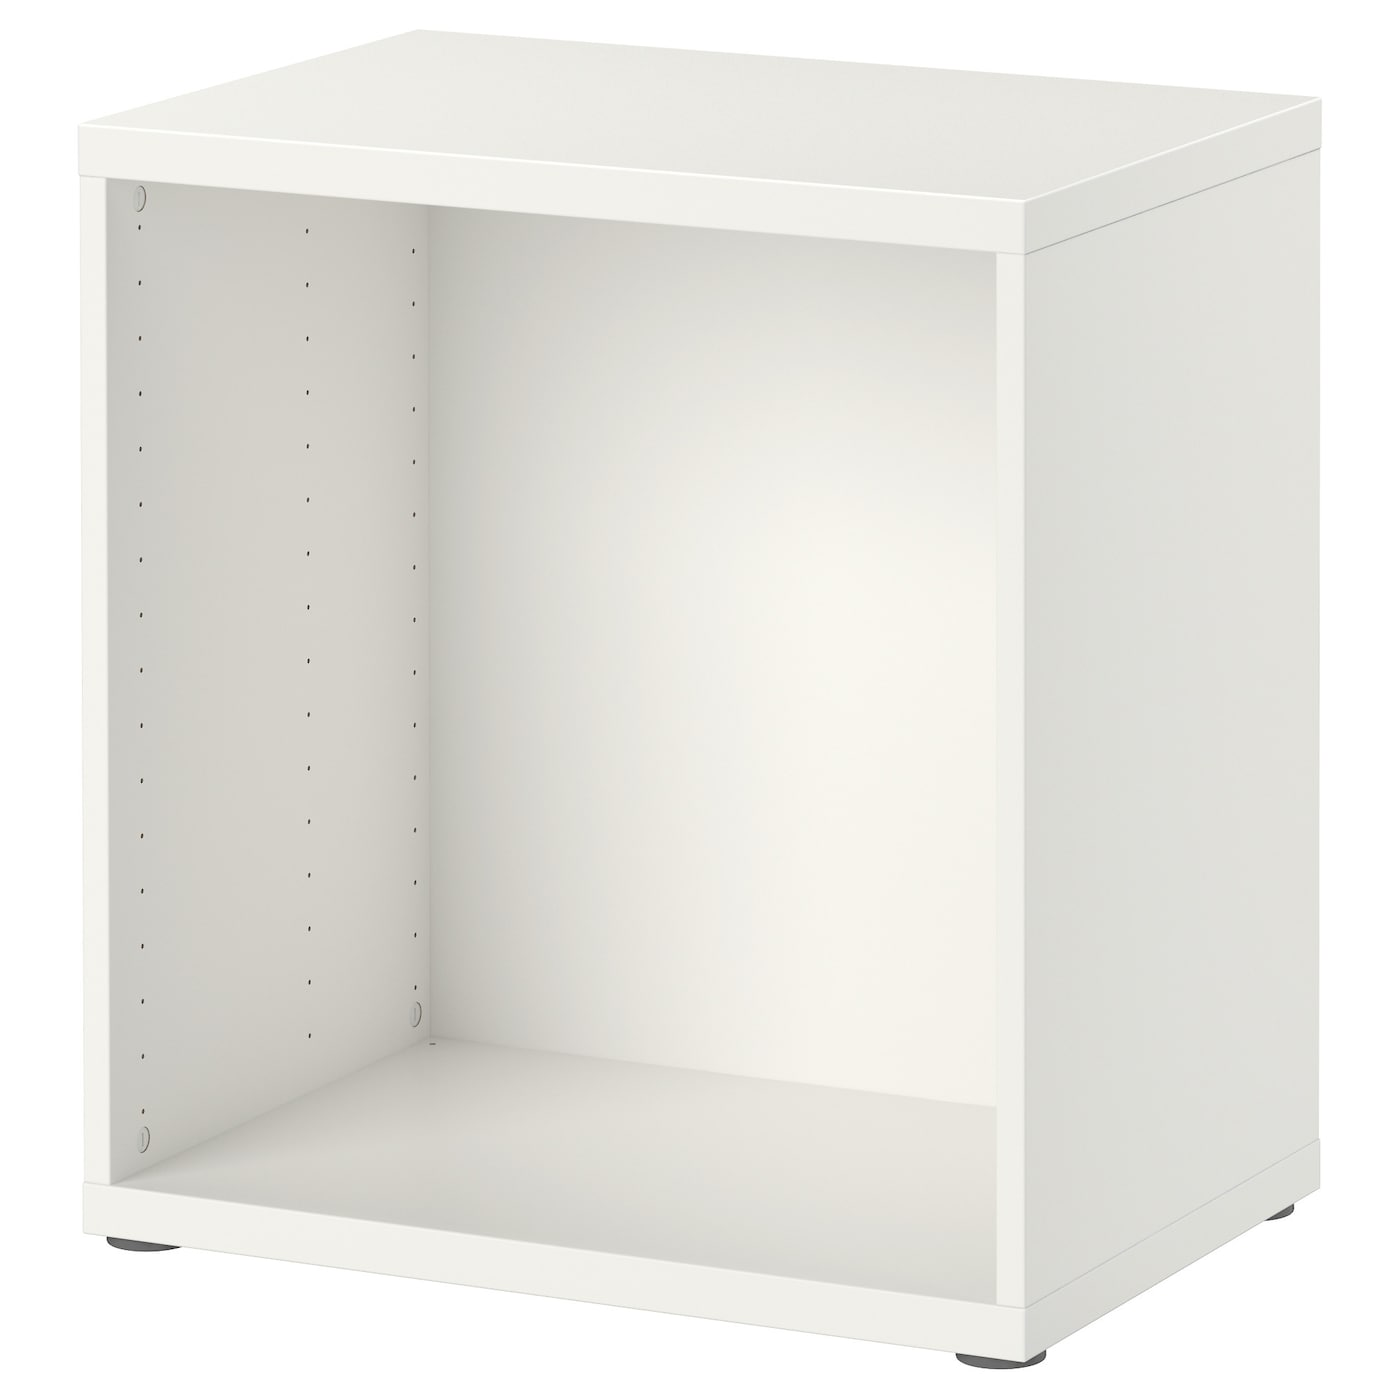 best basiselement wit 60x40x64 cm ikea. Black Bedroom Furniture Sets. Home Design Ideas